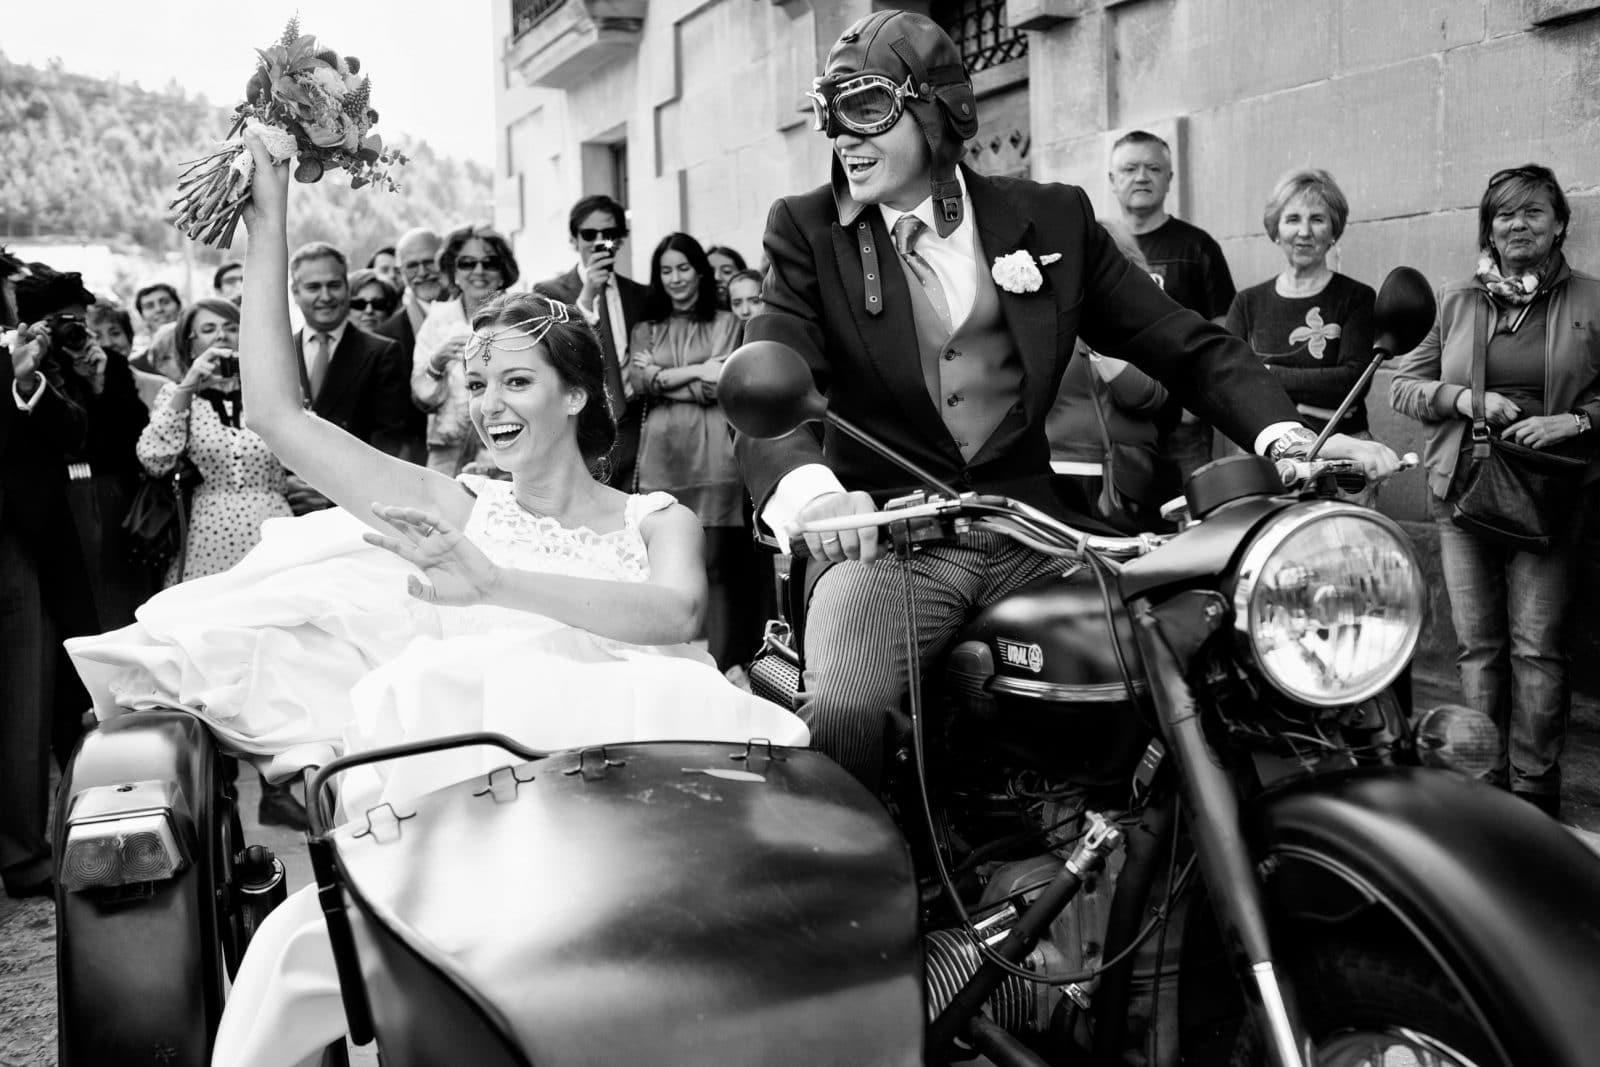 Wedding Photo by Hiram Trillo